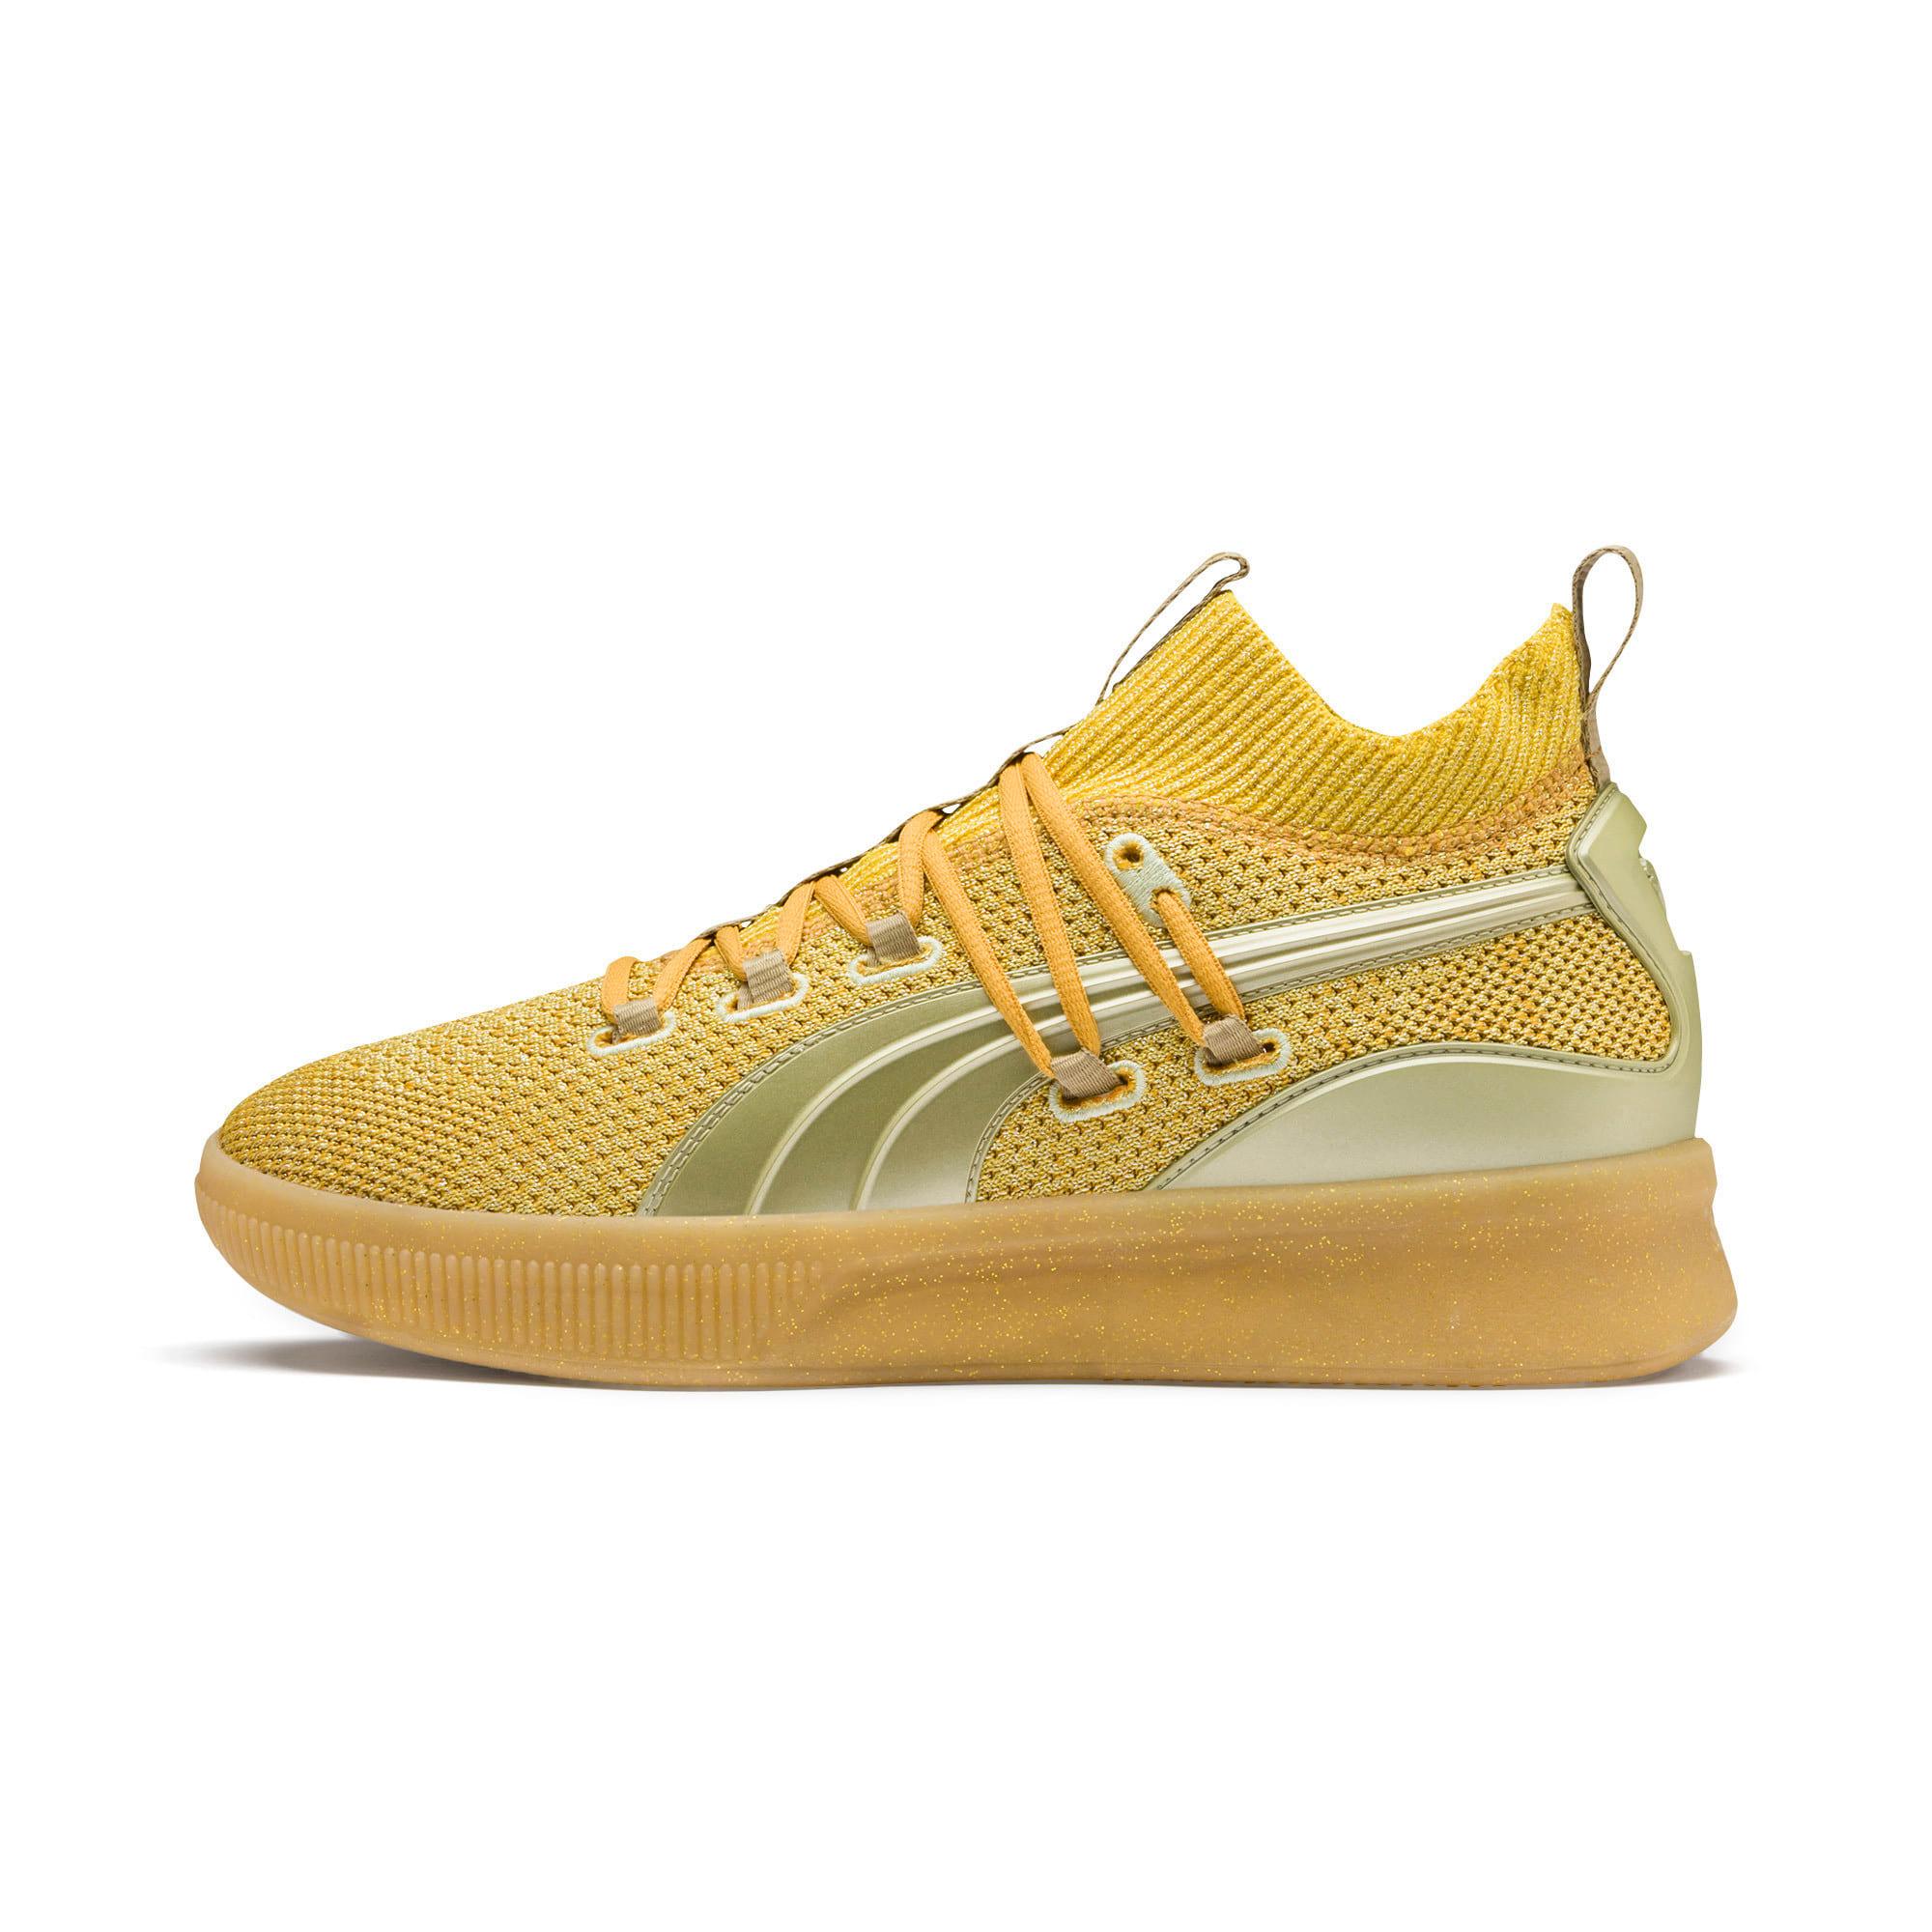 Thumbnail 1 of Clyde Court Title Run Basketball Shoes, Metallic Gold, medium